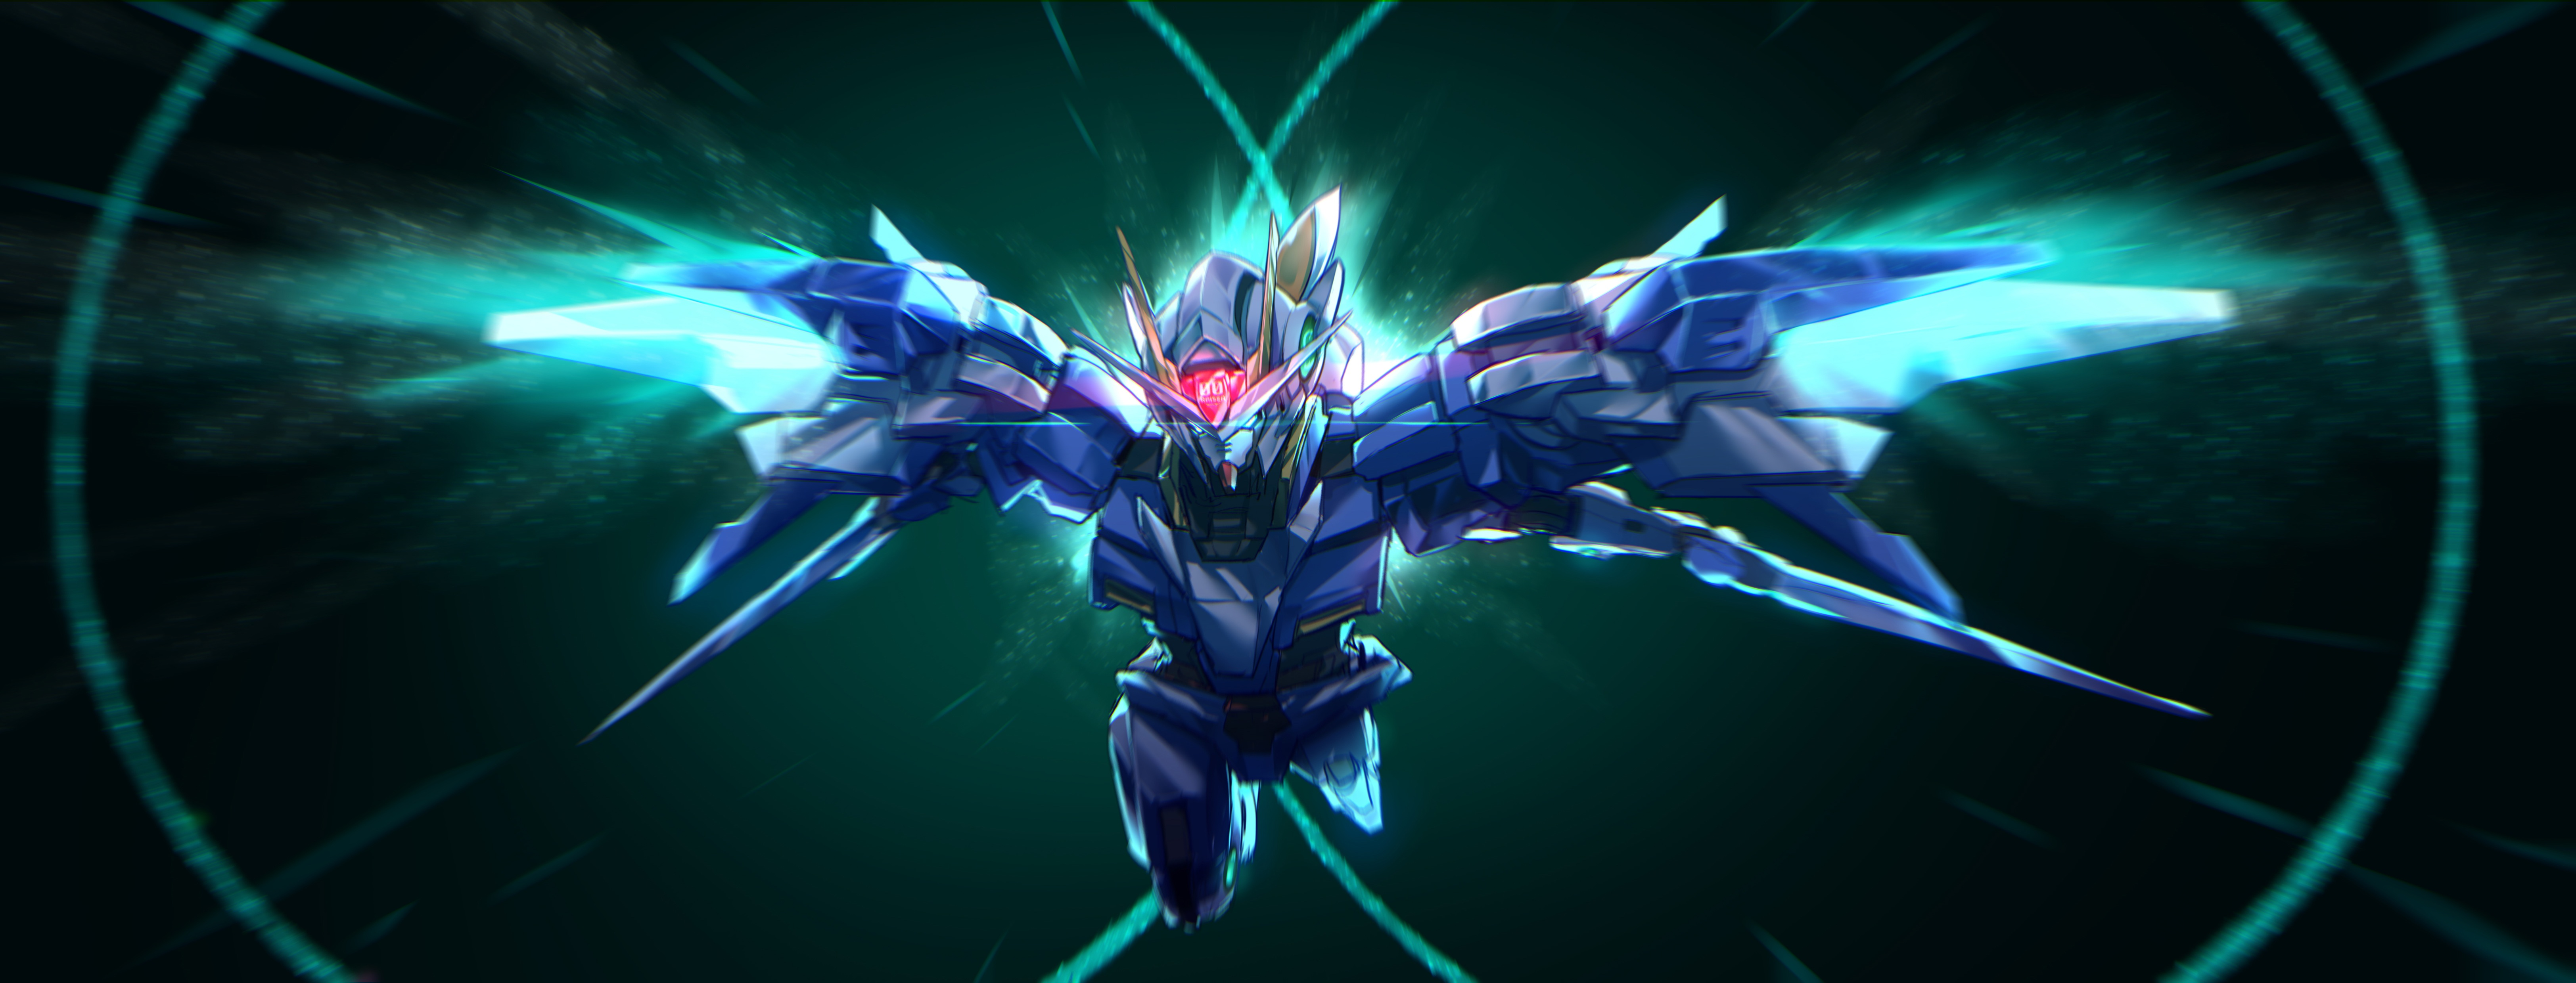 Gundam 00 Wallpapers